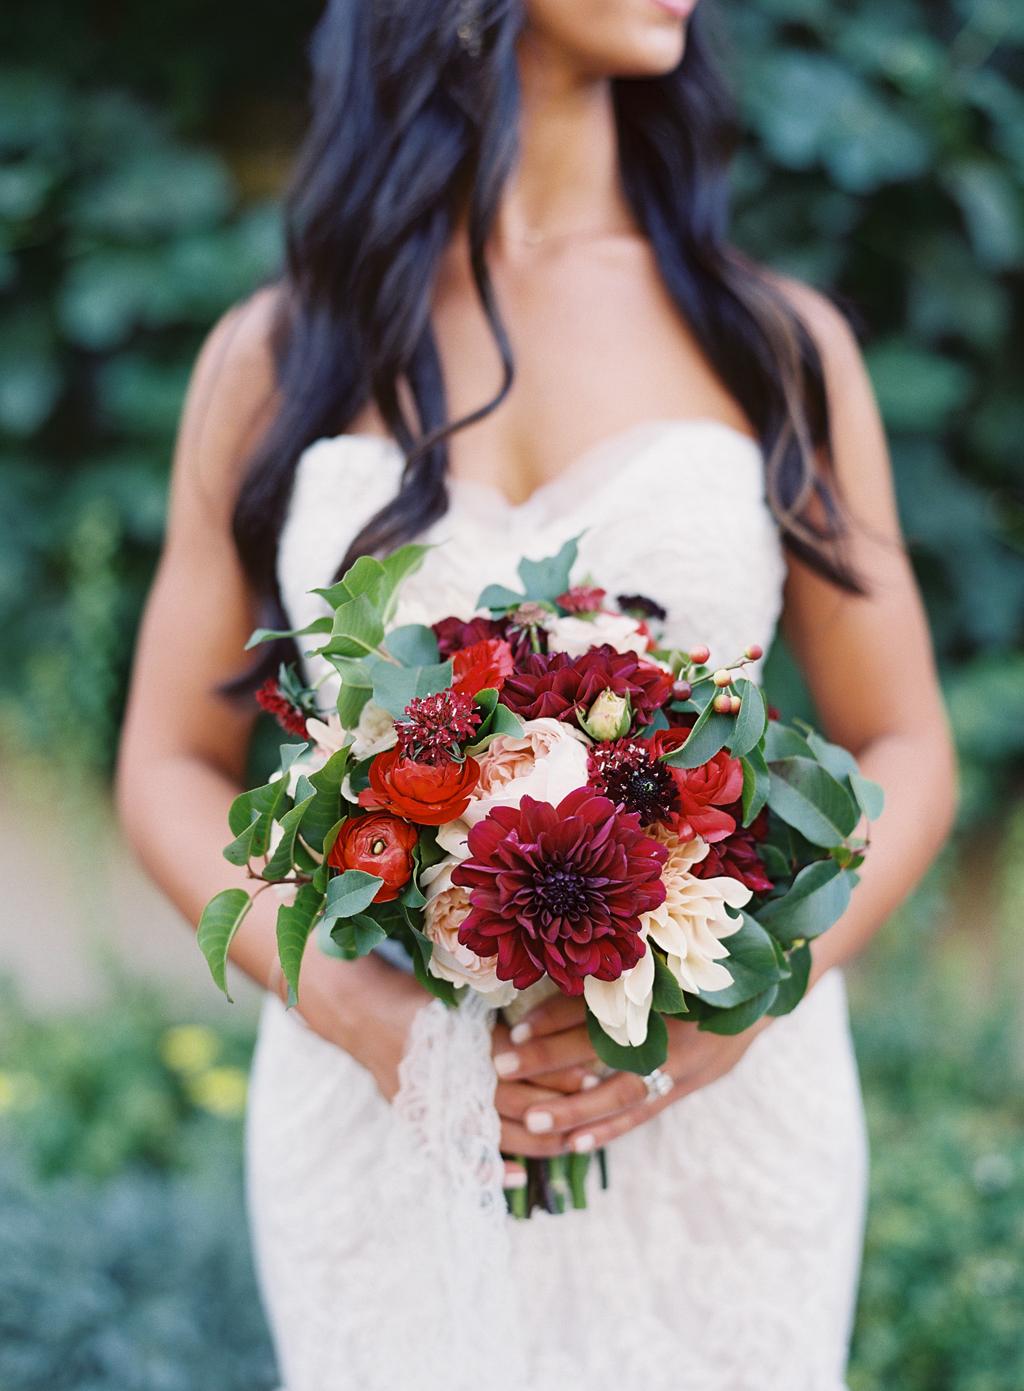 a wedding bouquet shot on film.